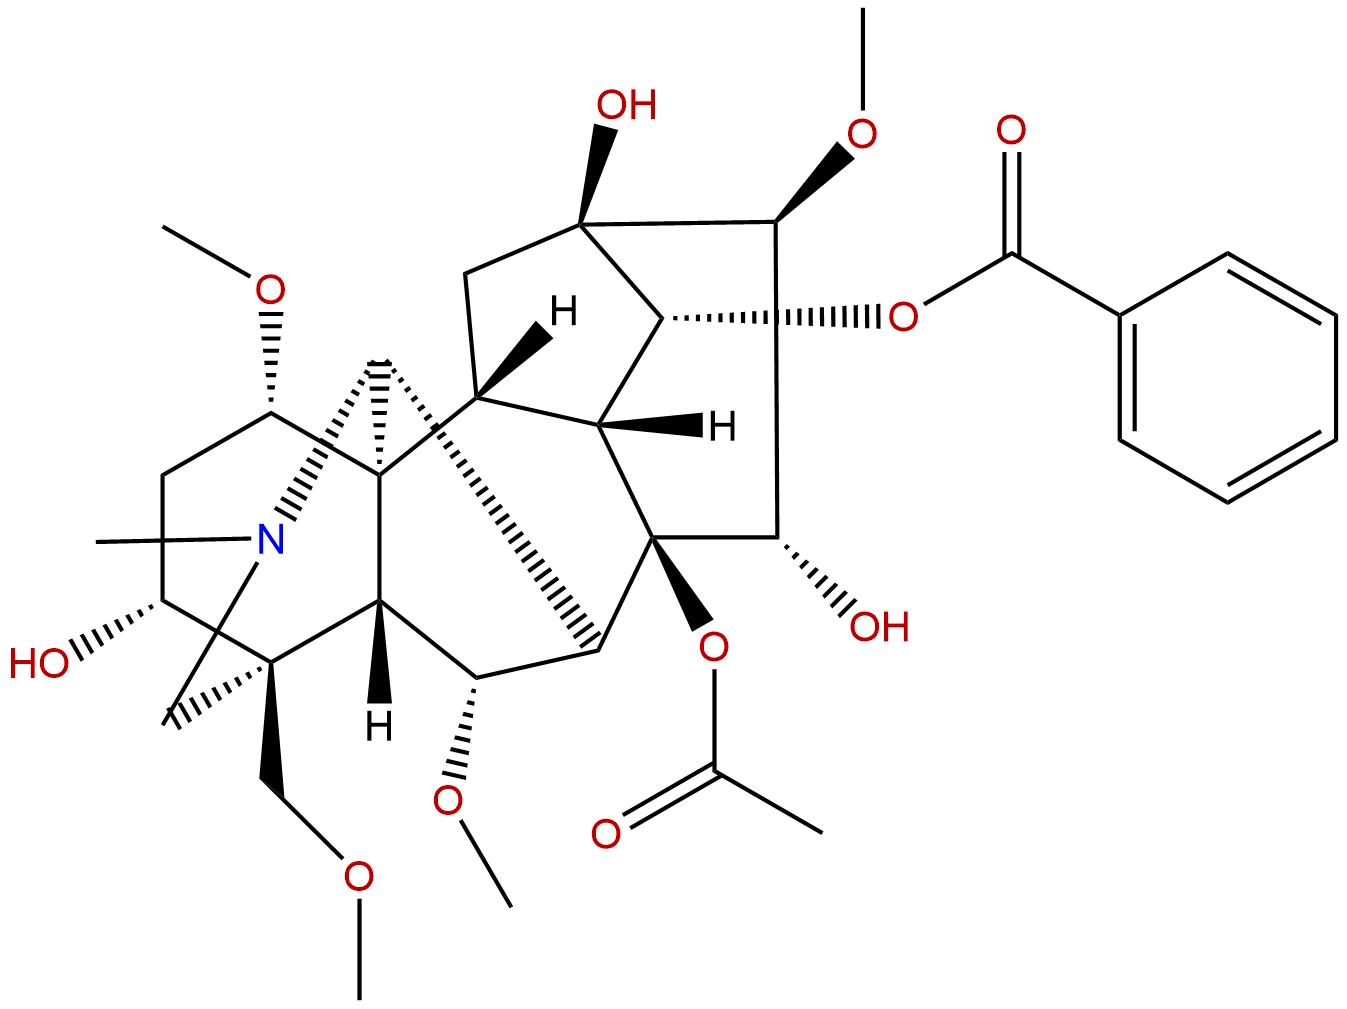 Mesaconitine